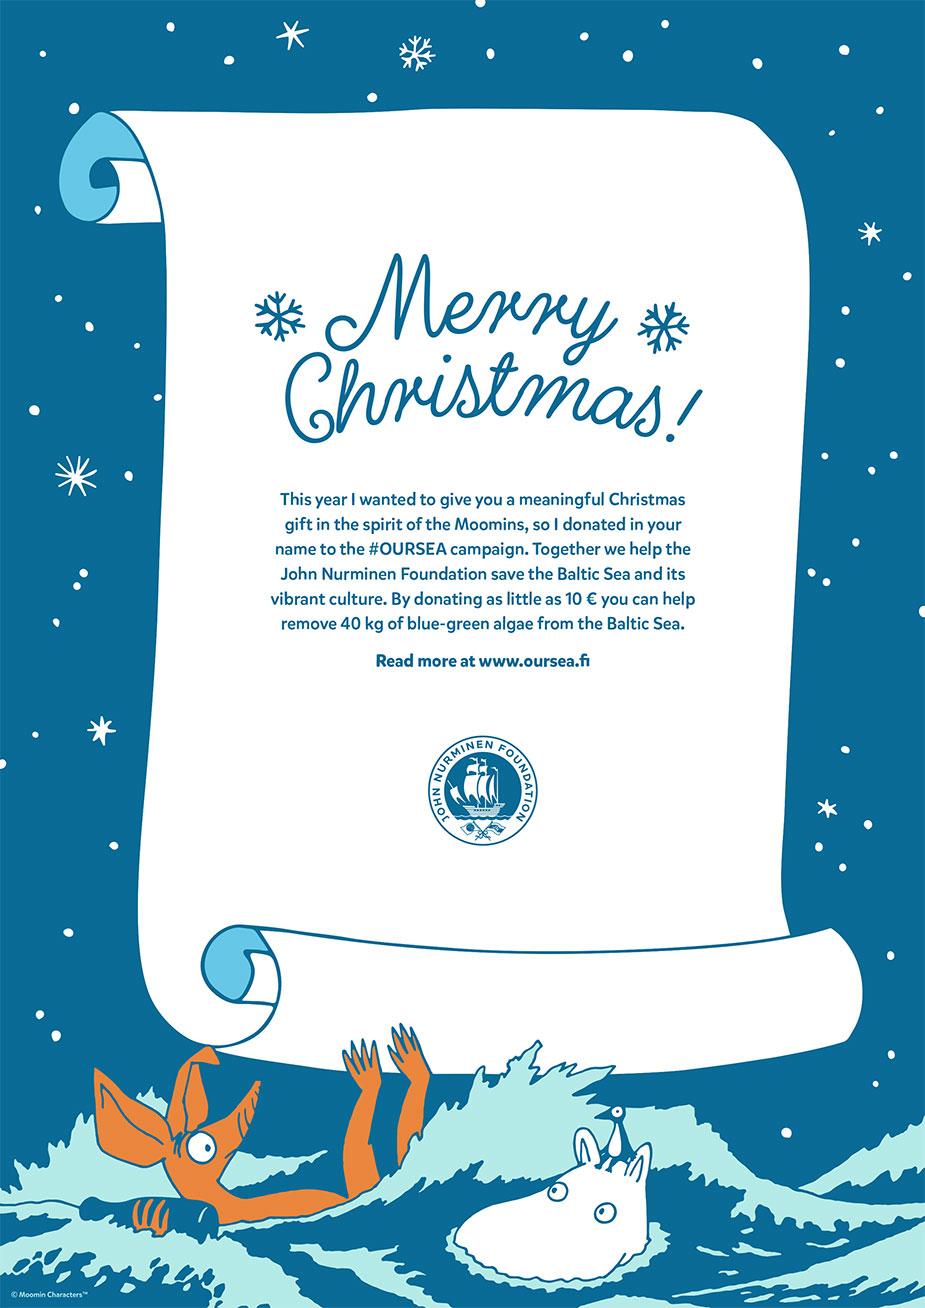 oursea_en_christmas